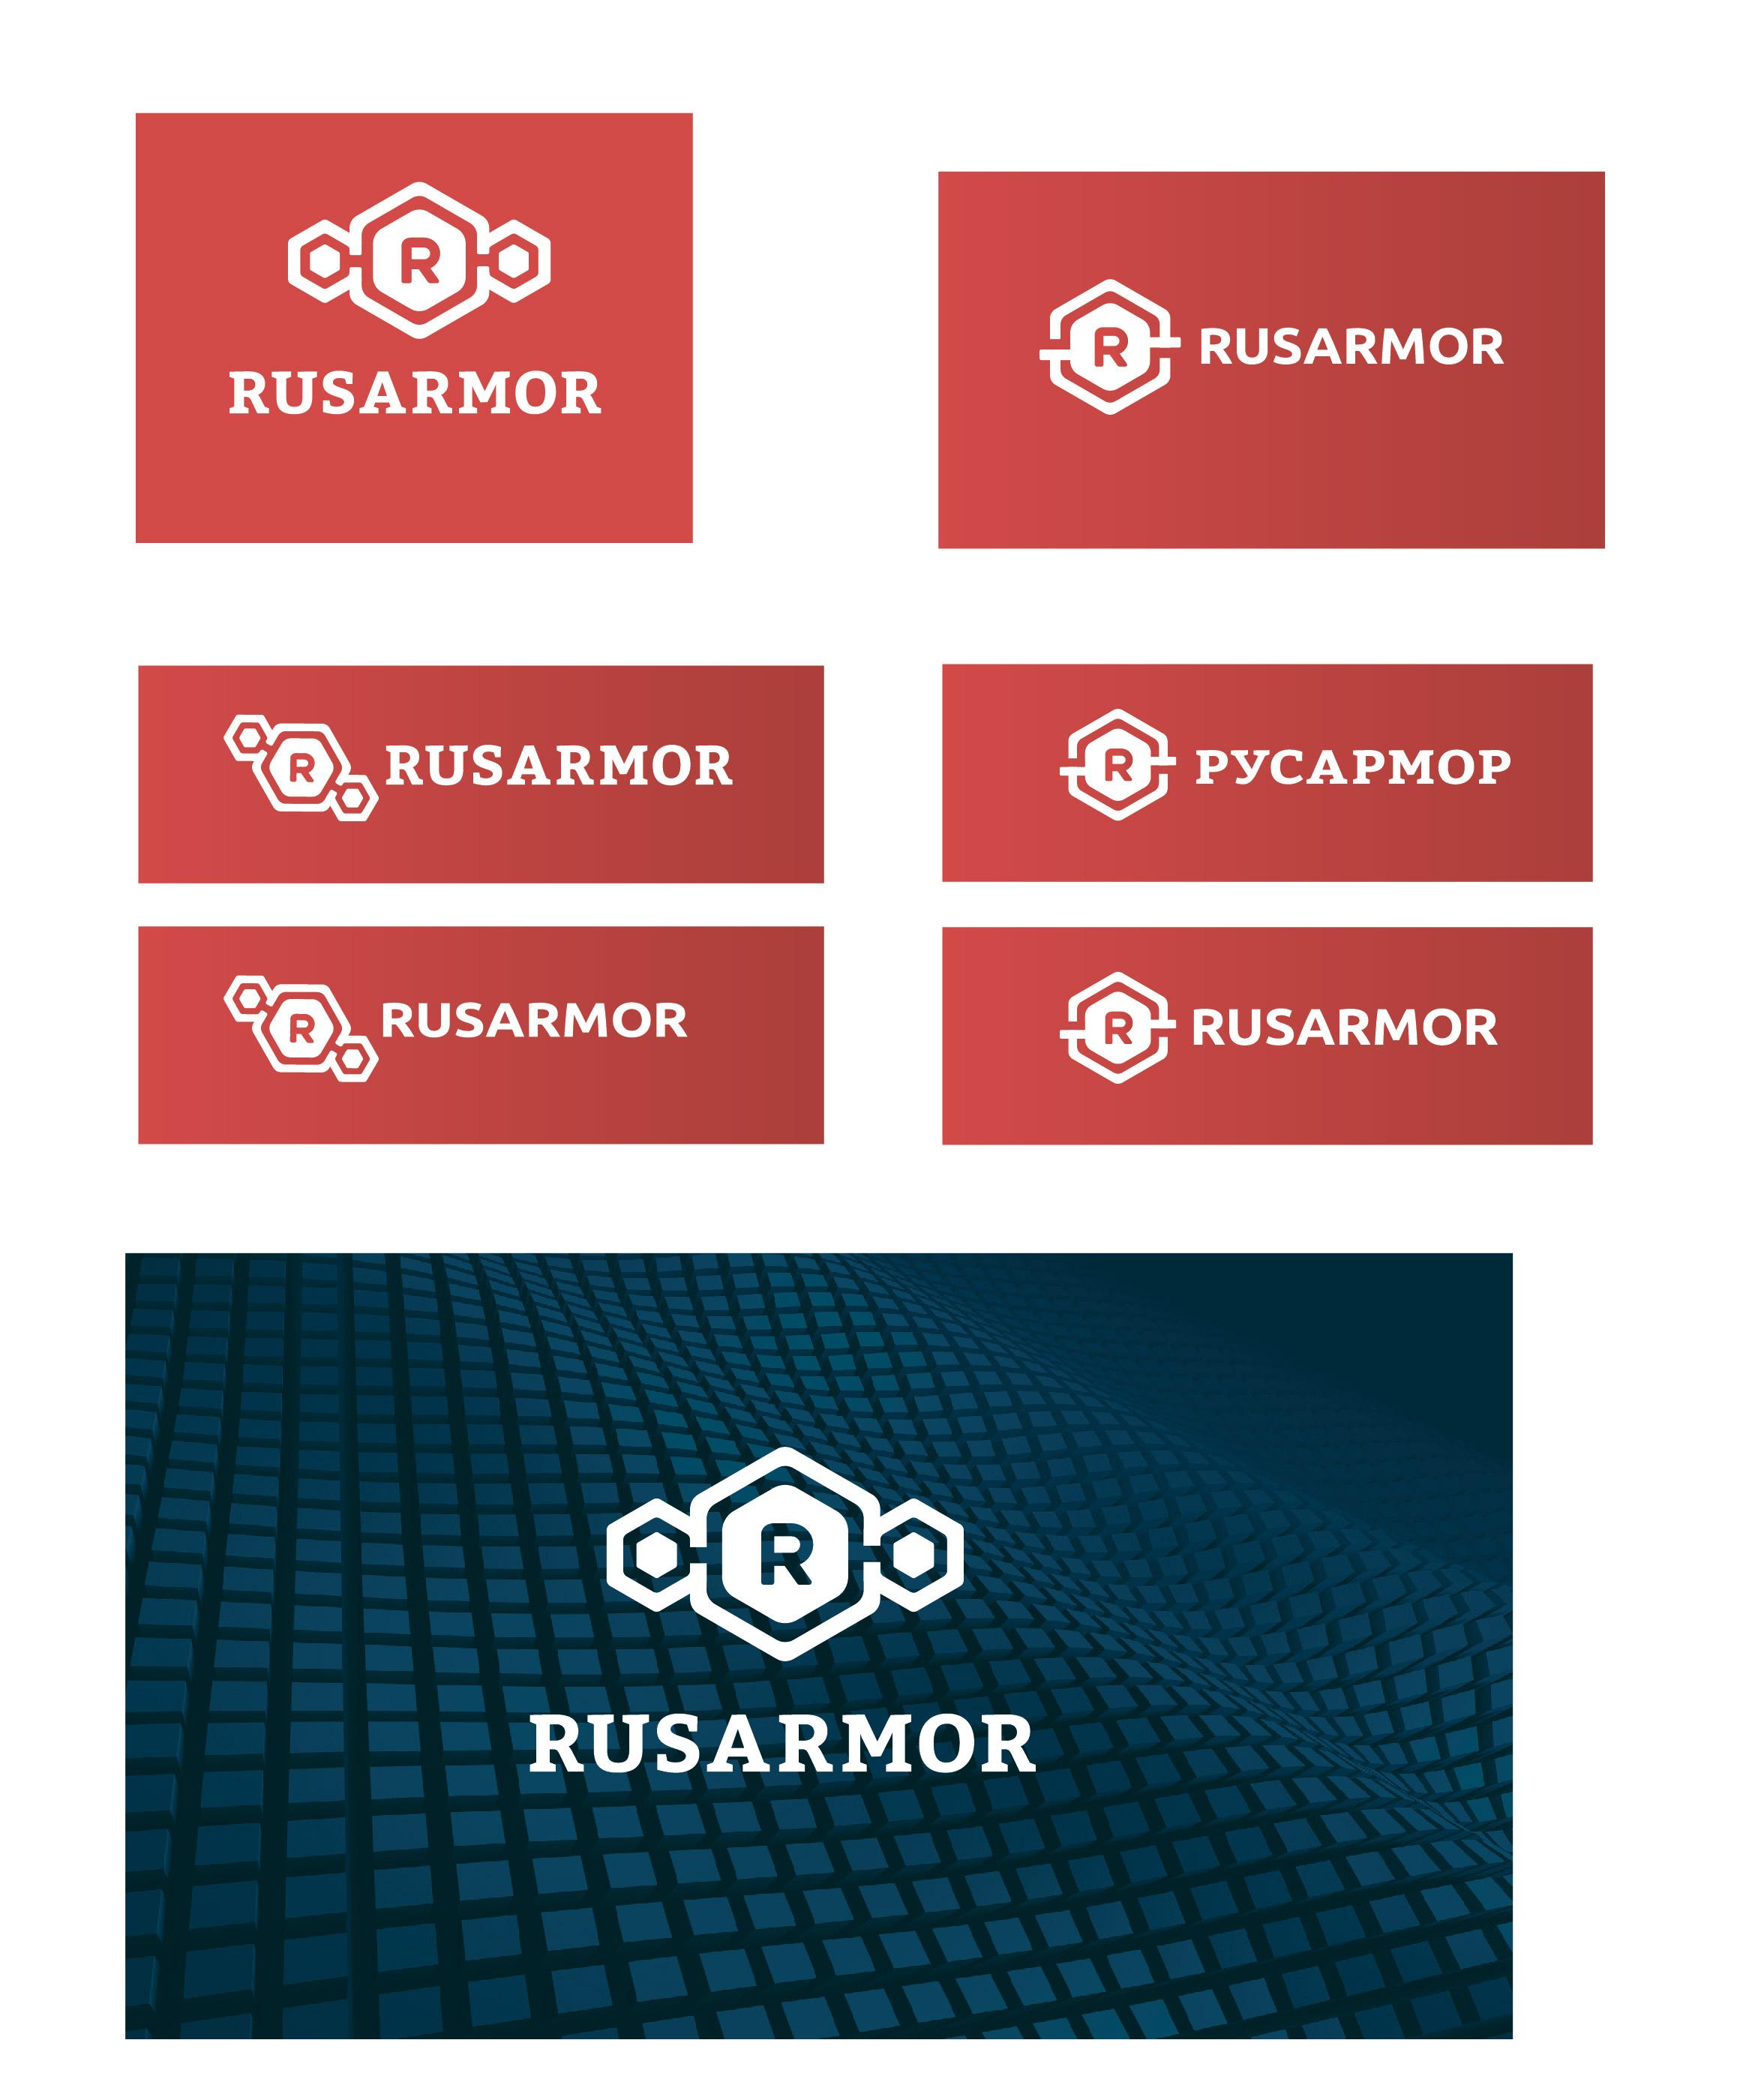 Разработка логотипа технологического стартапа РУСАРМОР фото f_3355a0c8e5e74057.jpg